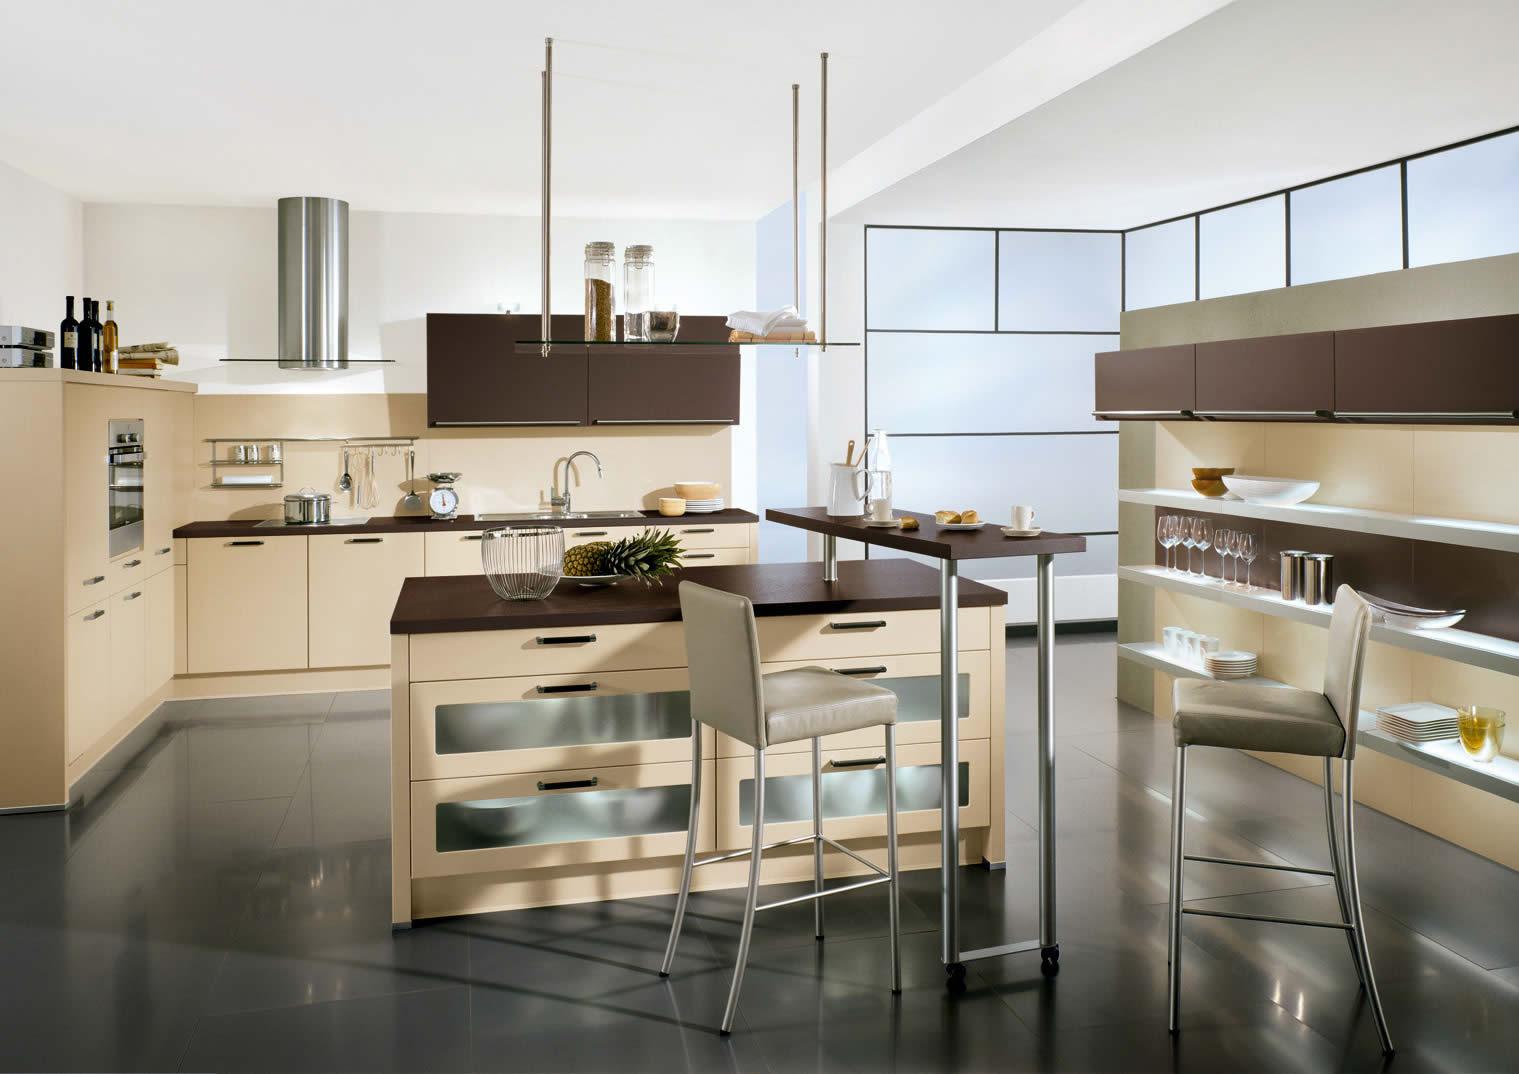 style-cafe-kitchen-interior-idea-kitchen decor theme ideas